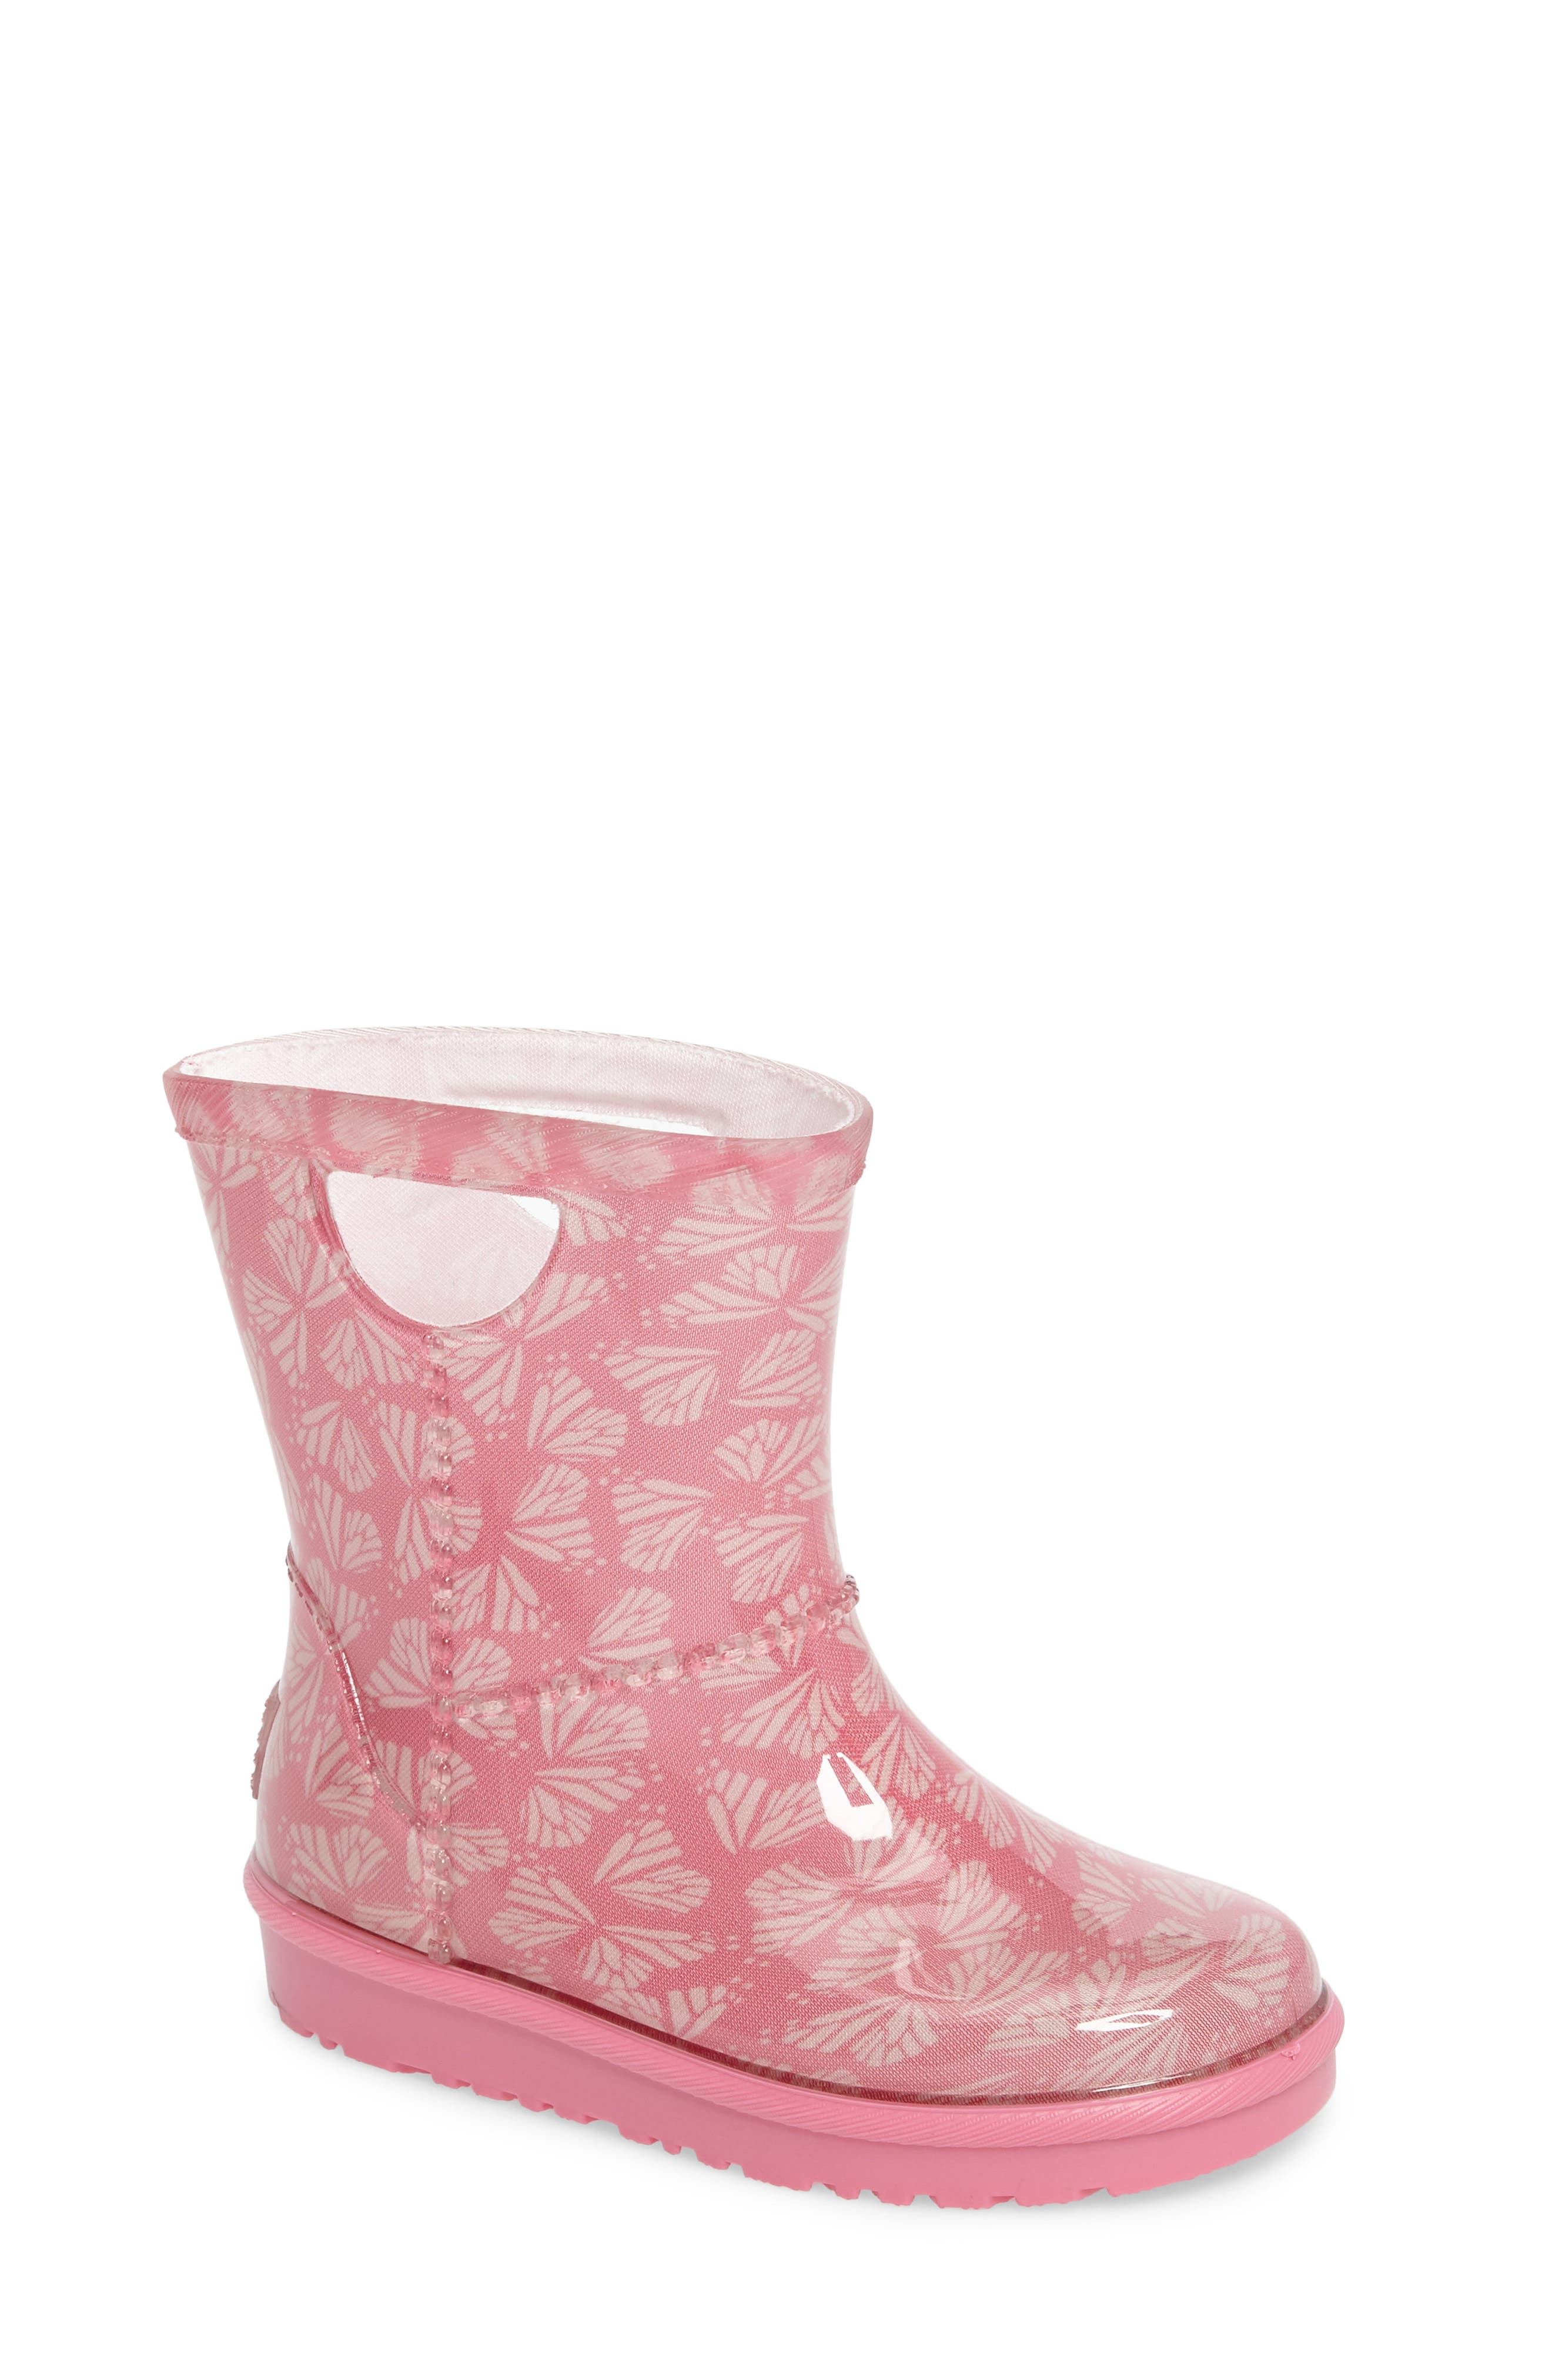 Rahjee Rain Boot,                             Main thumbnail 1, color,                             Pink Azalea